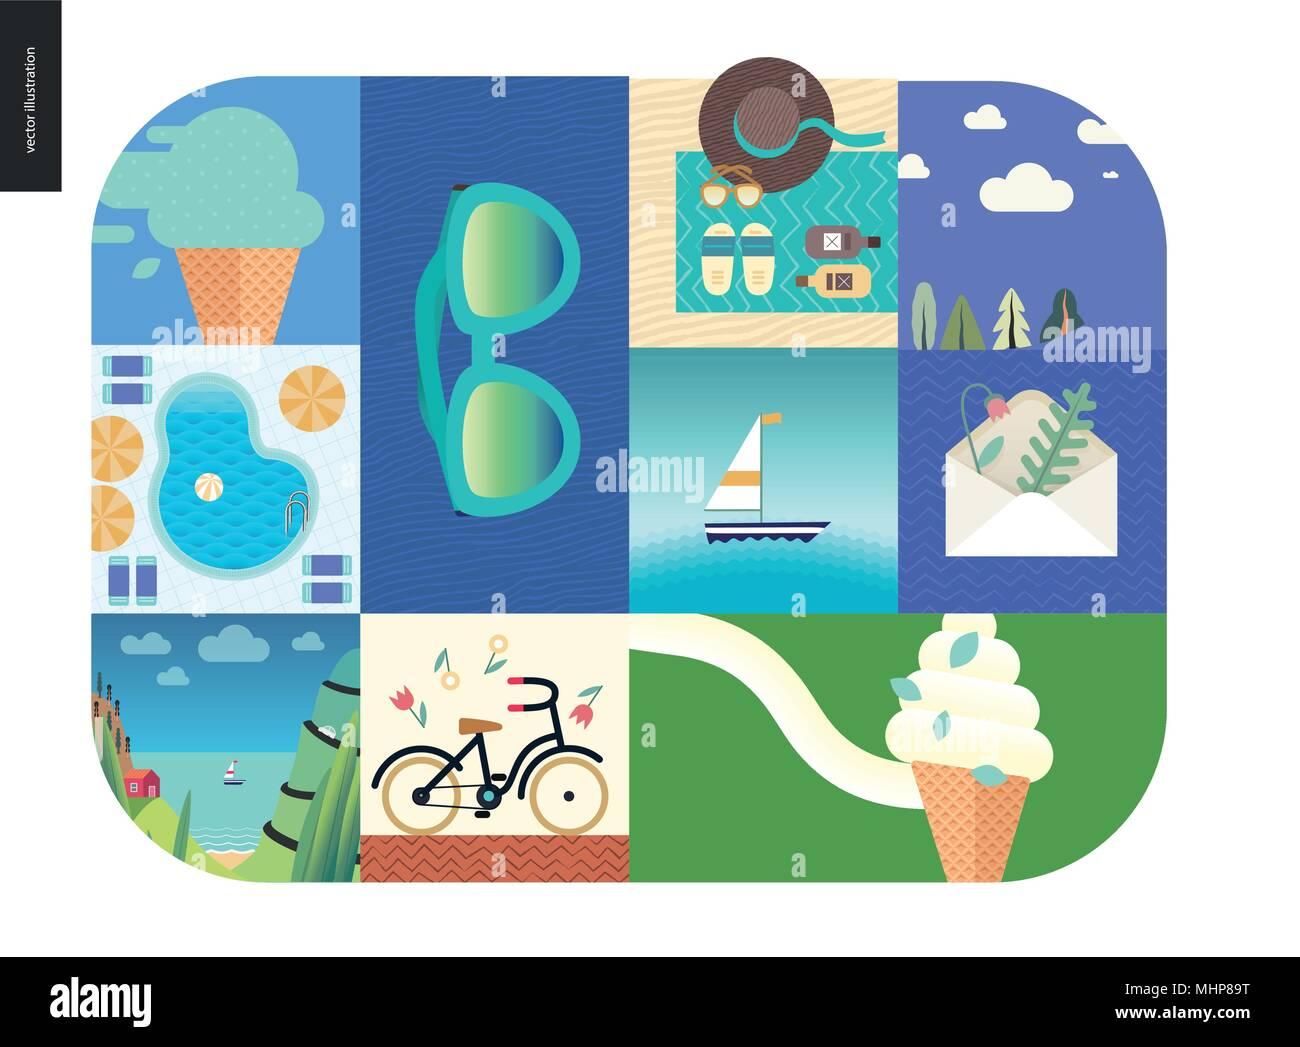 Cose semplici vacanze cartoon piatta illustrazione - Cose semplici da cucinare ...